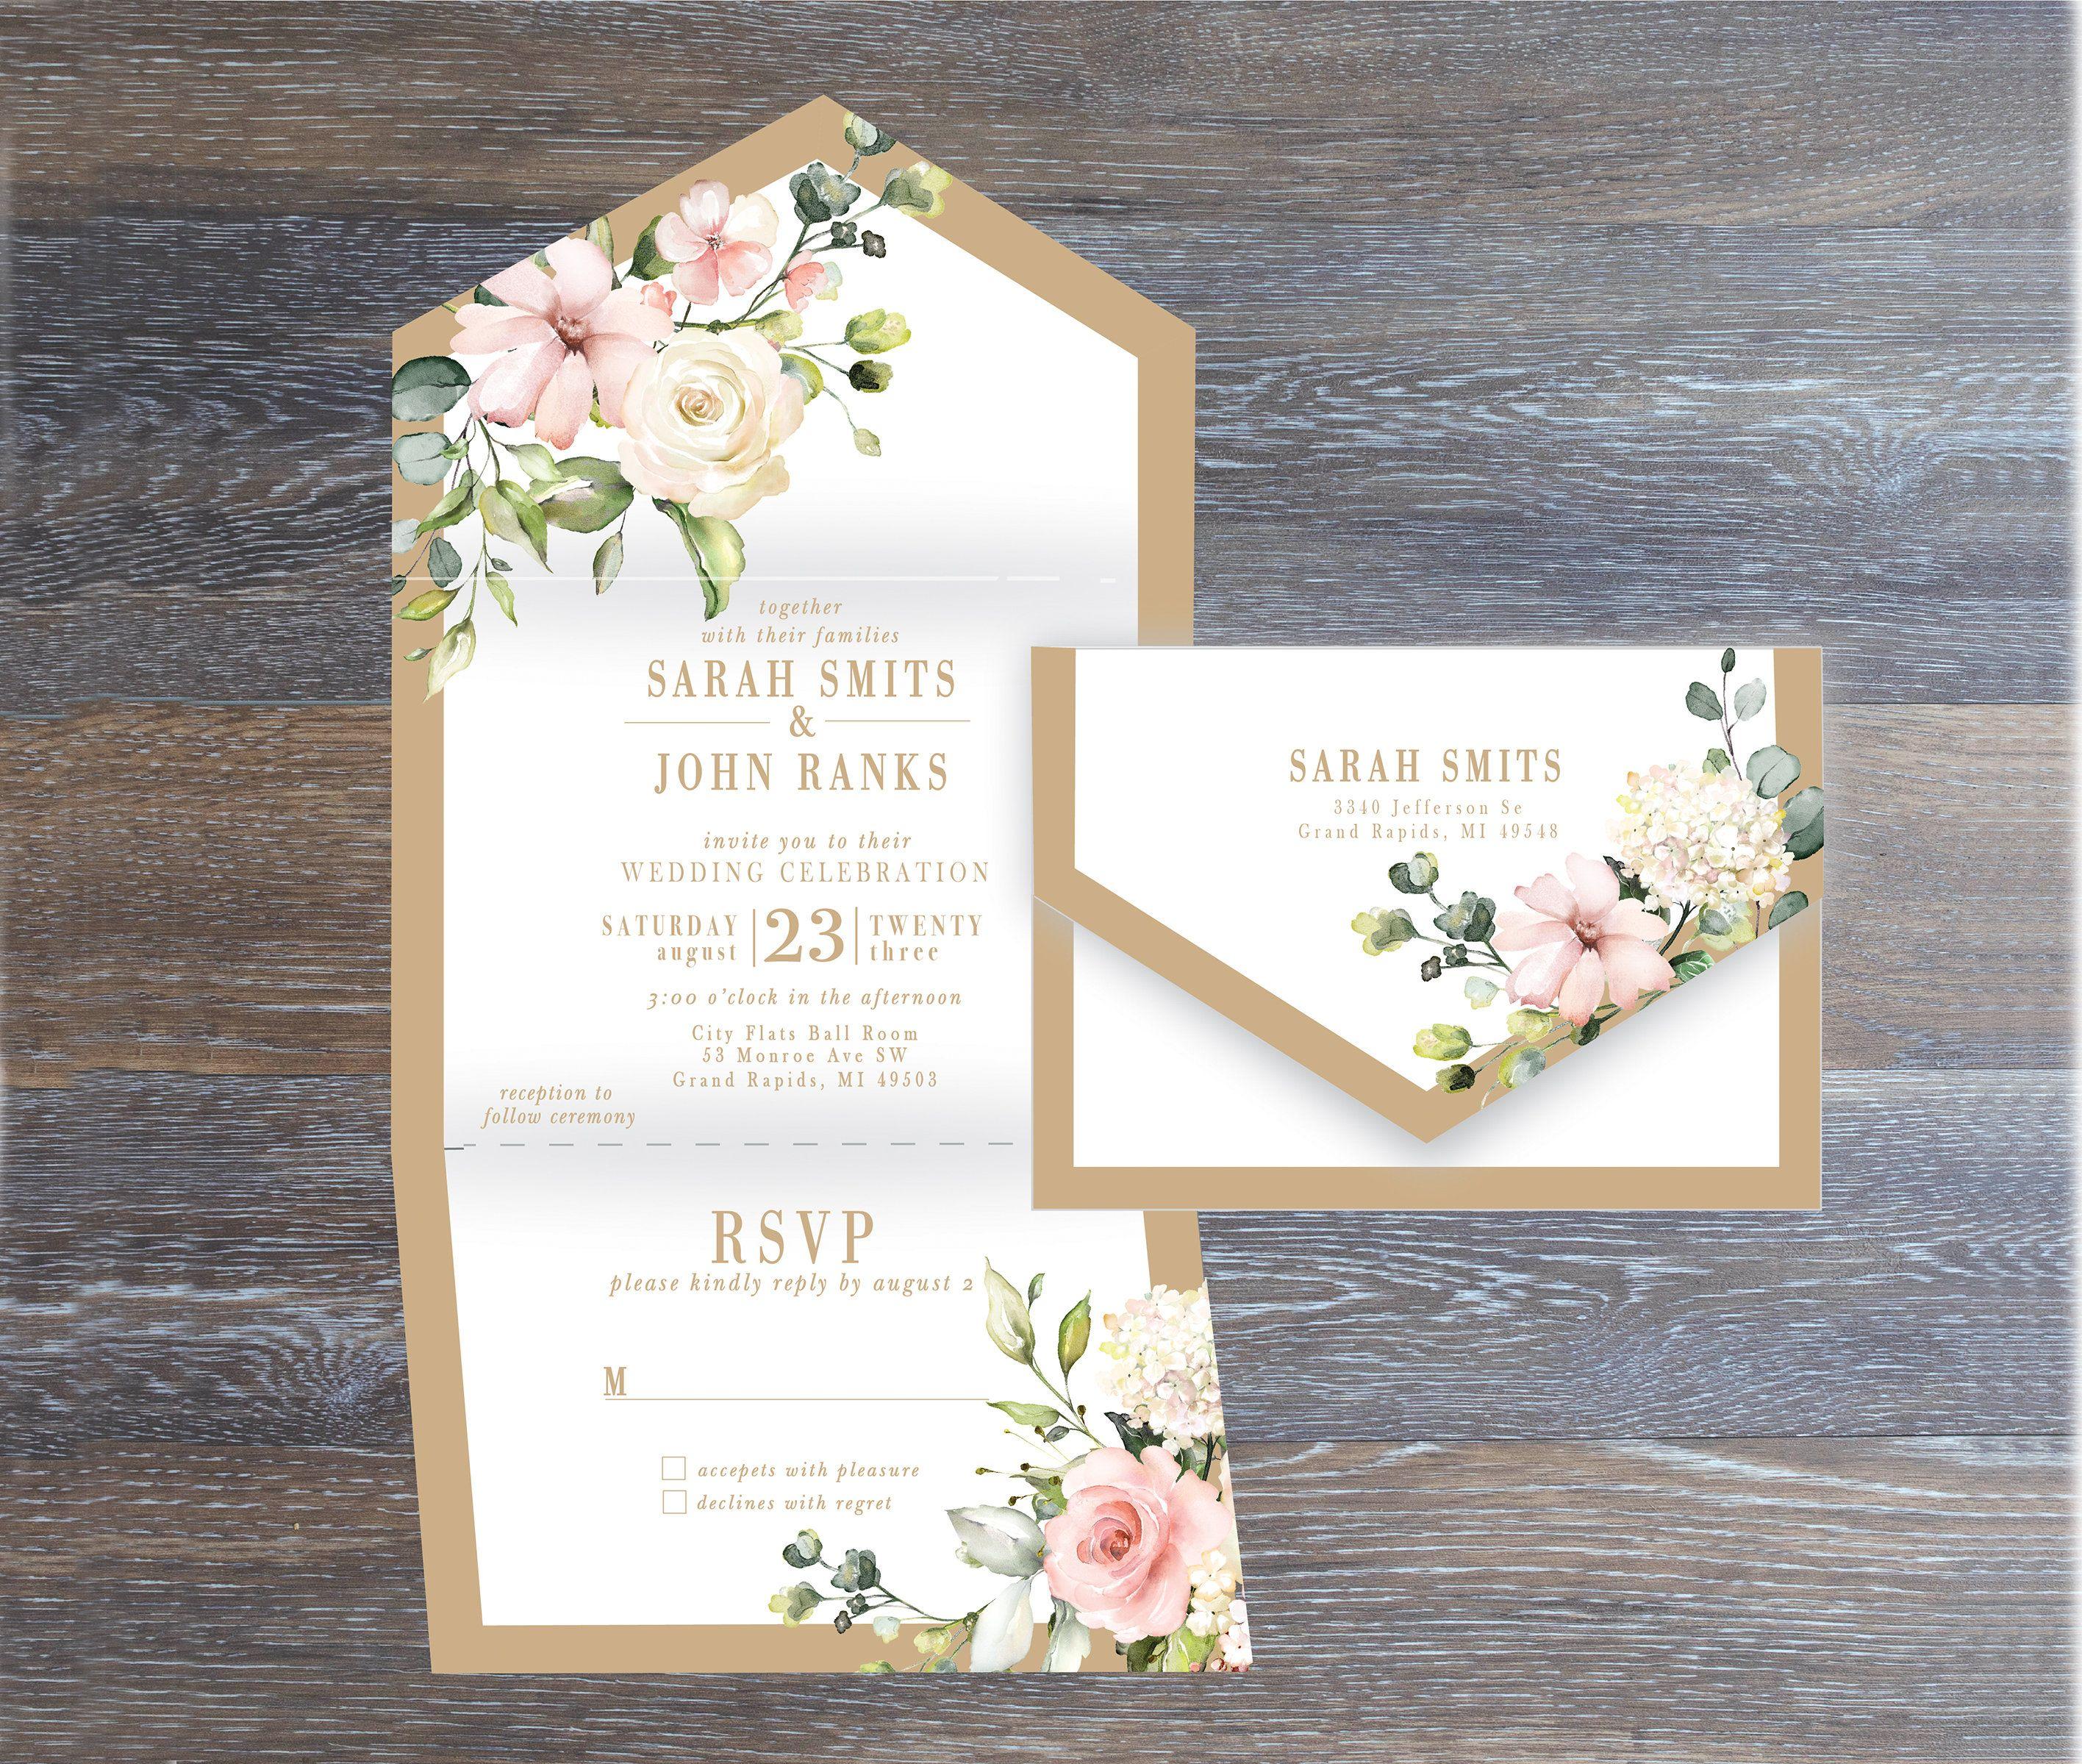 Printed allinone wedding multifold invitation self